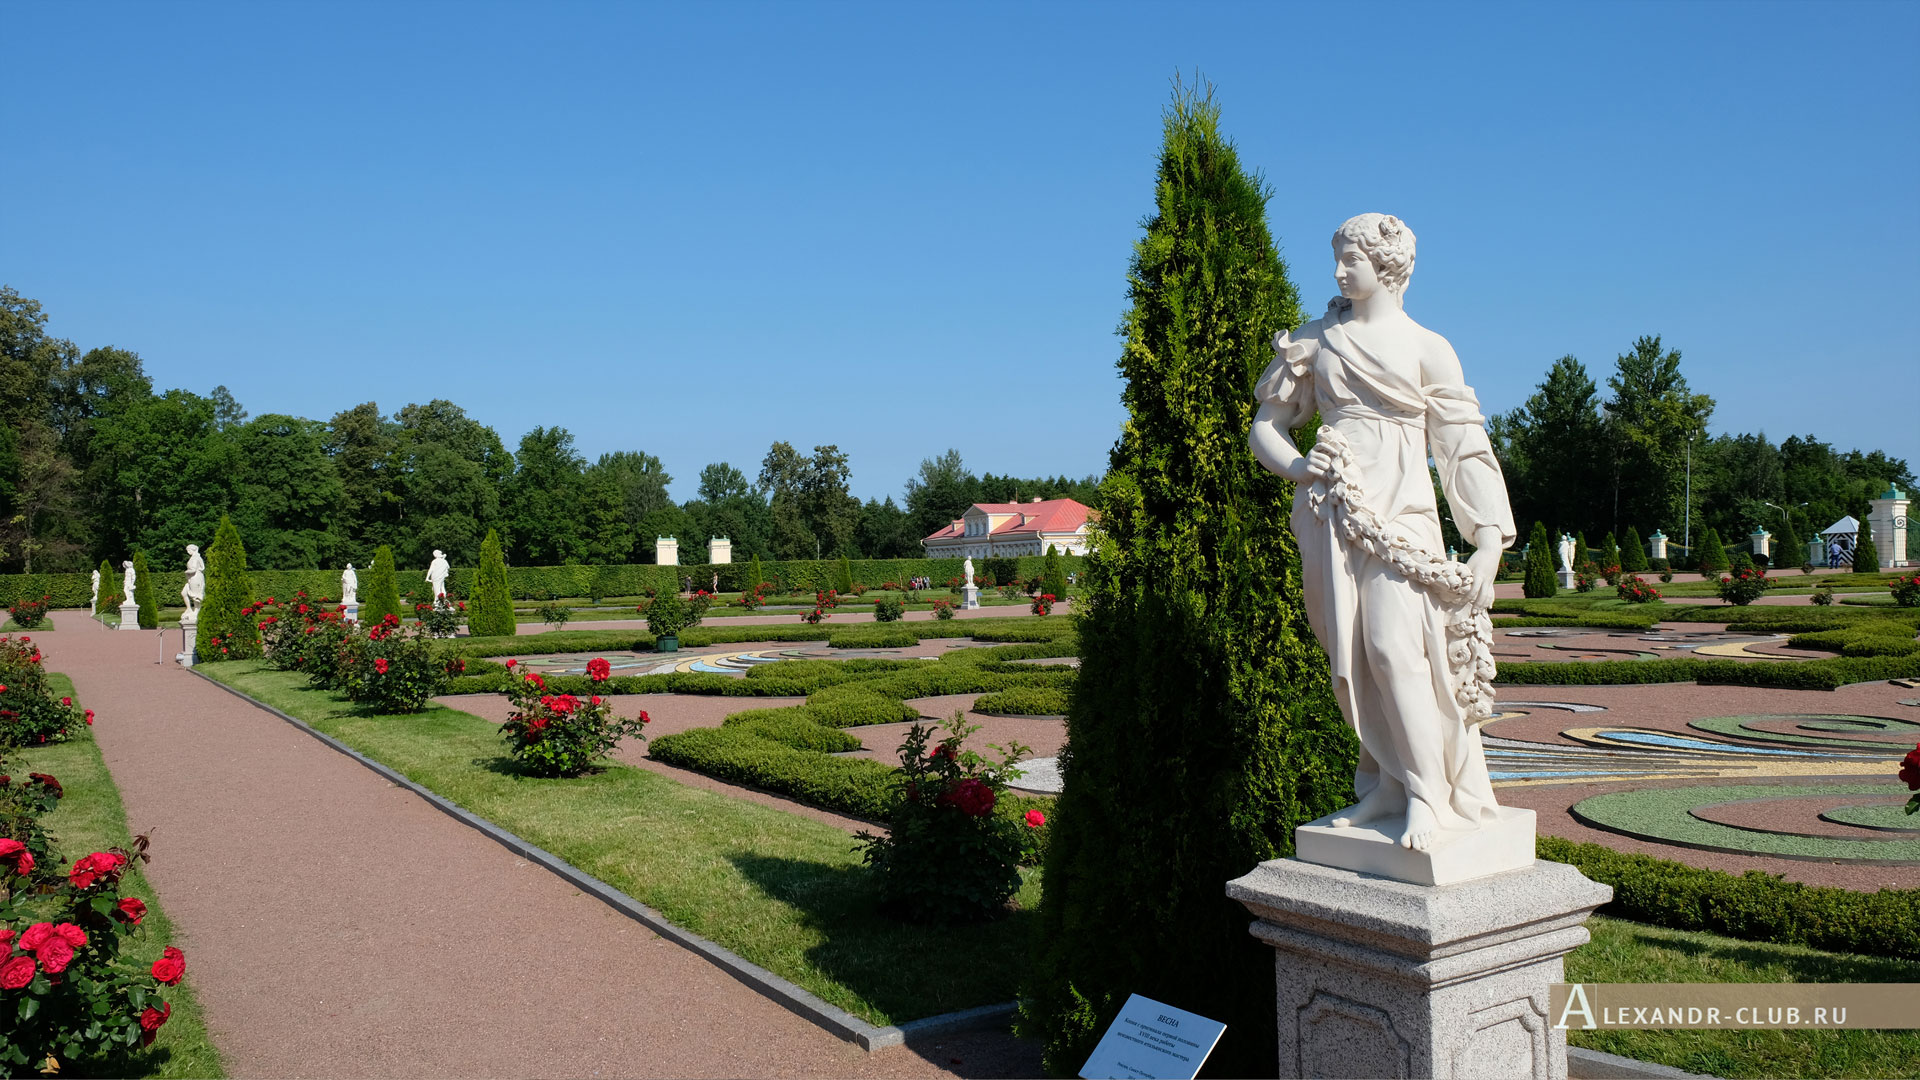 Ораниенбаум, лето, Нижний сад